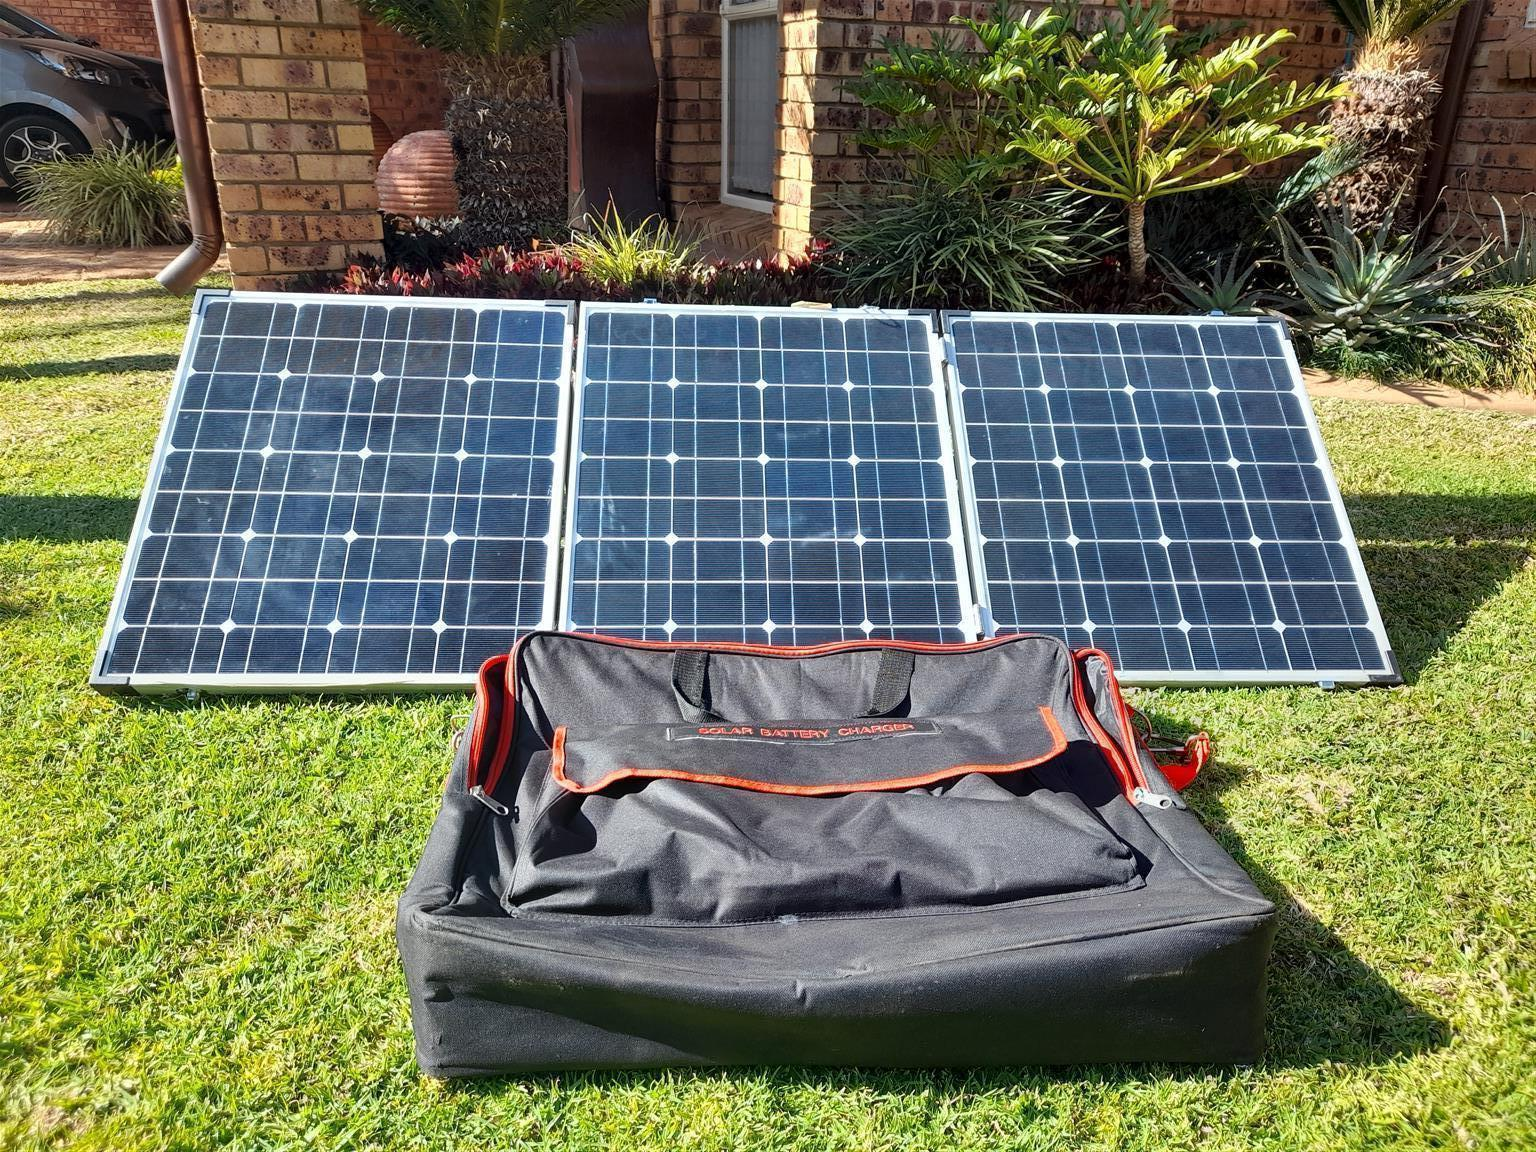 Sunlite 4 Life Solar Battery Charger